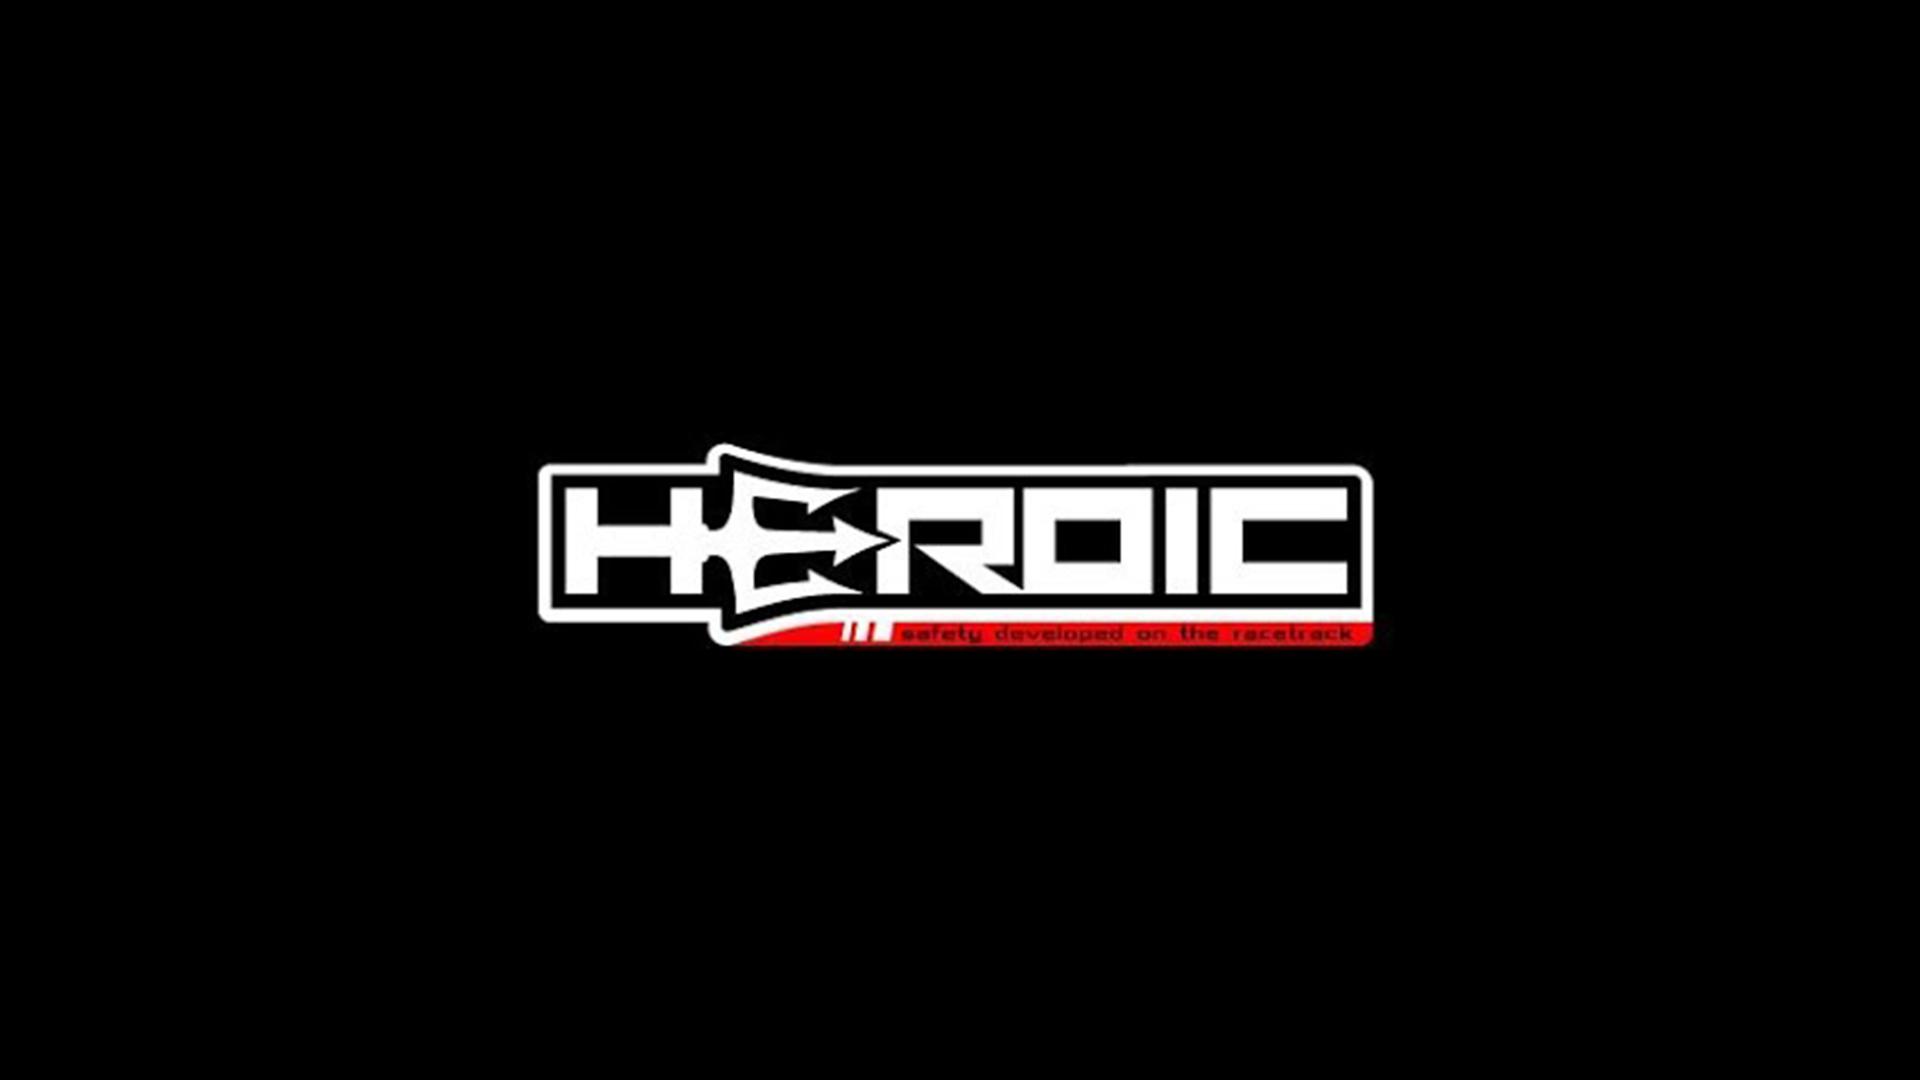 Heroic Racing Apparel - Promo Video